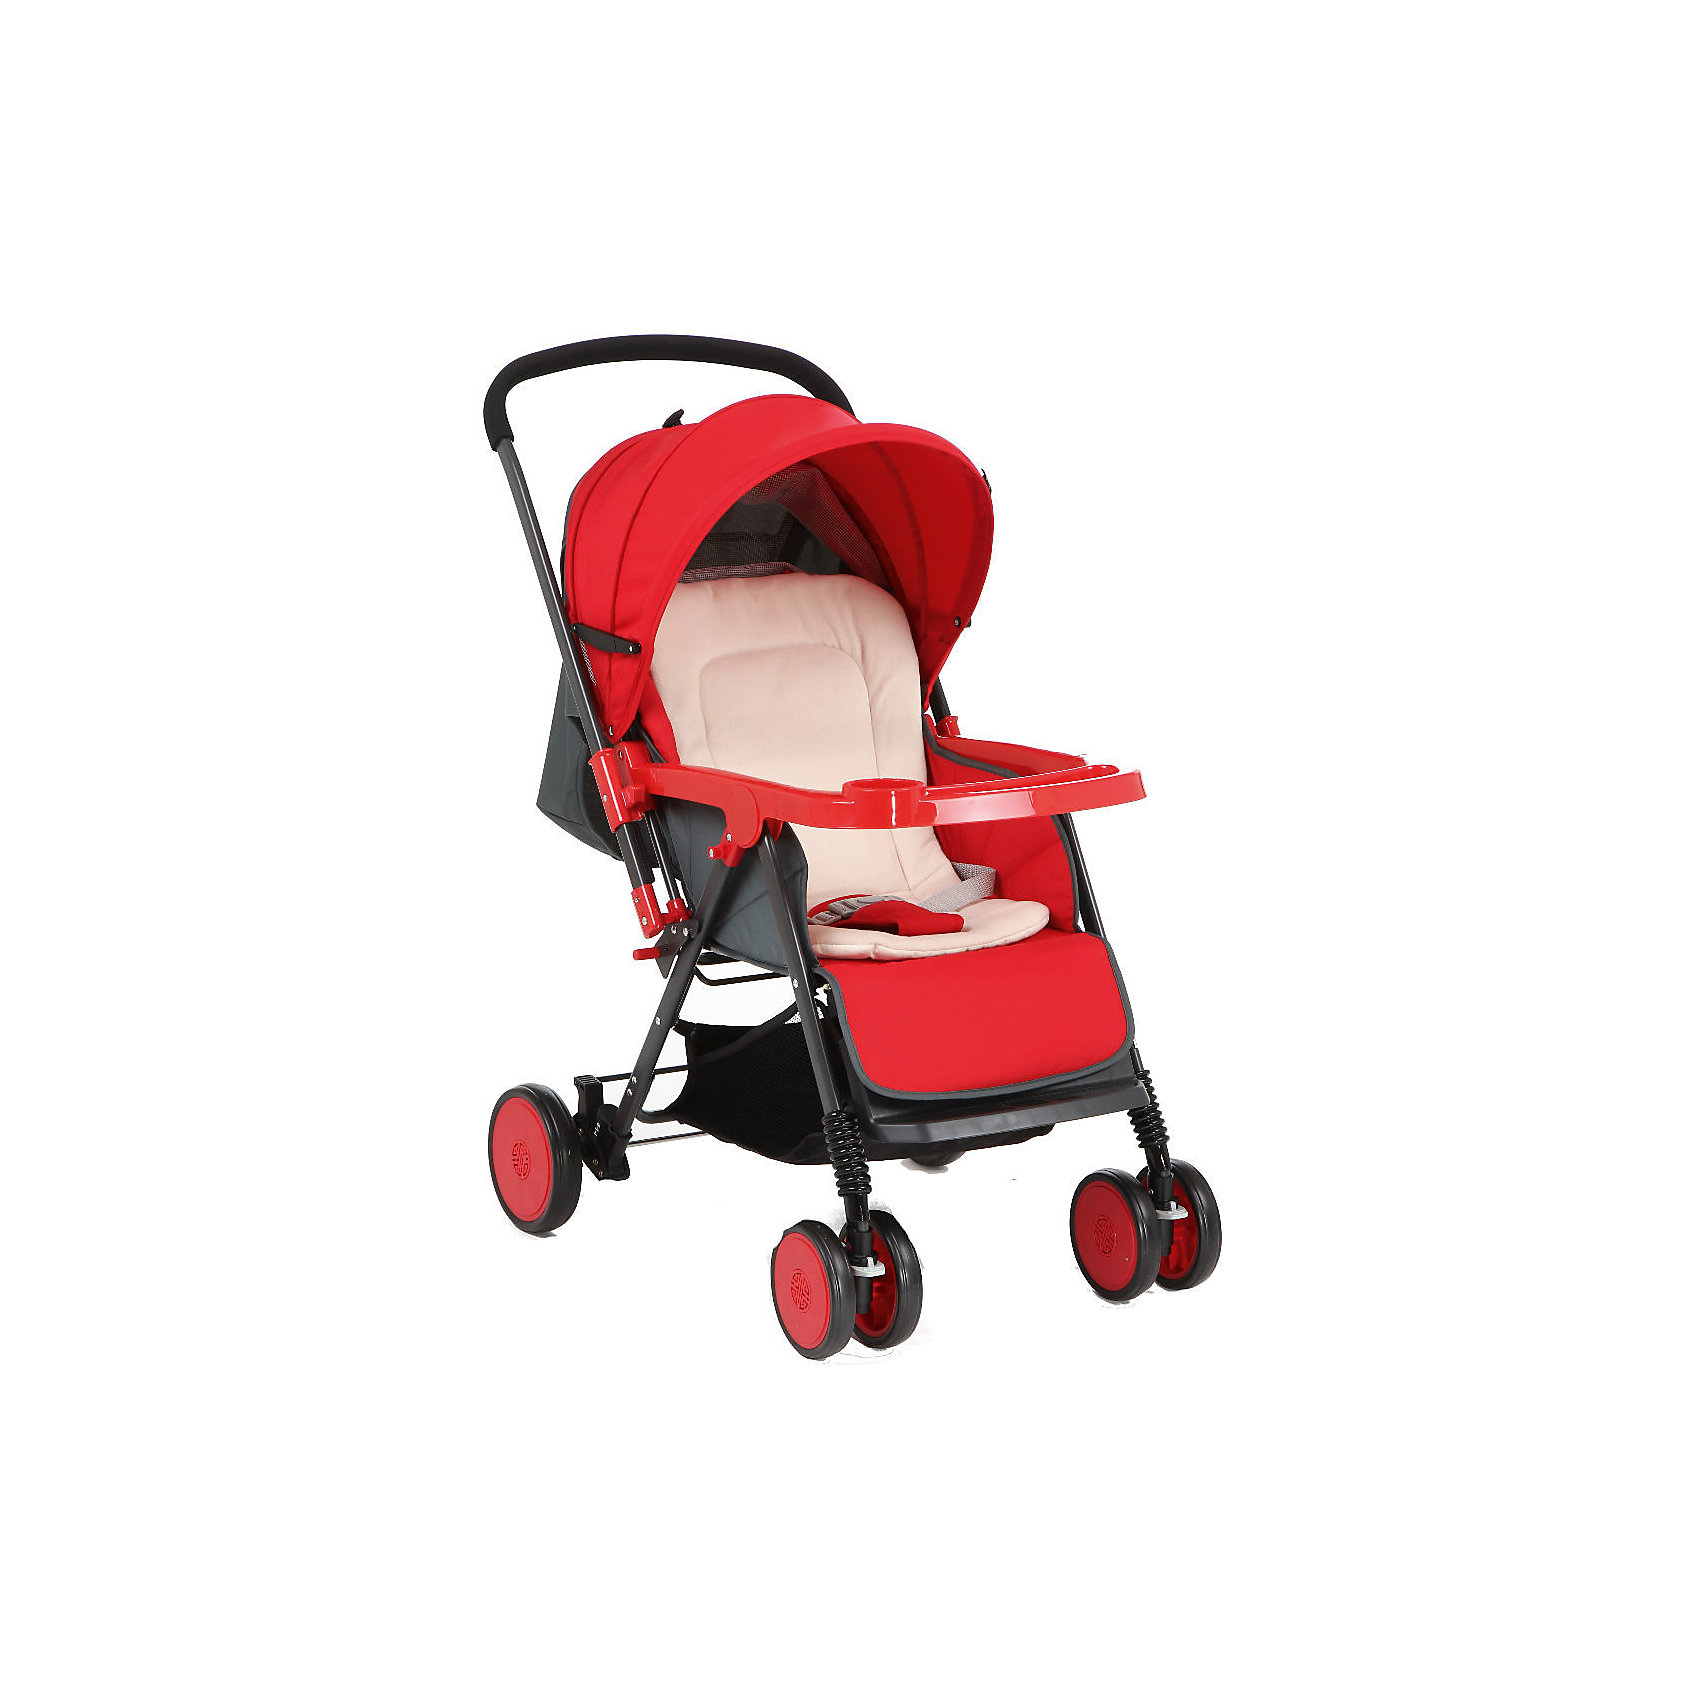 Corol Прогулочная коляска S-7, Corol, красный corol прогулочная s 3 светло серая